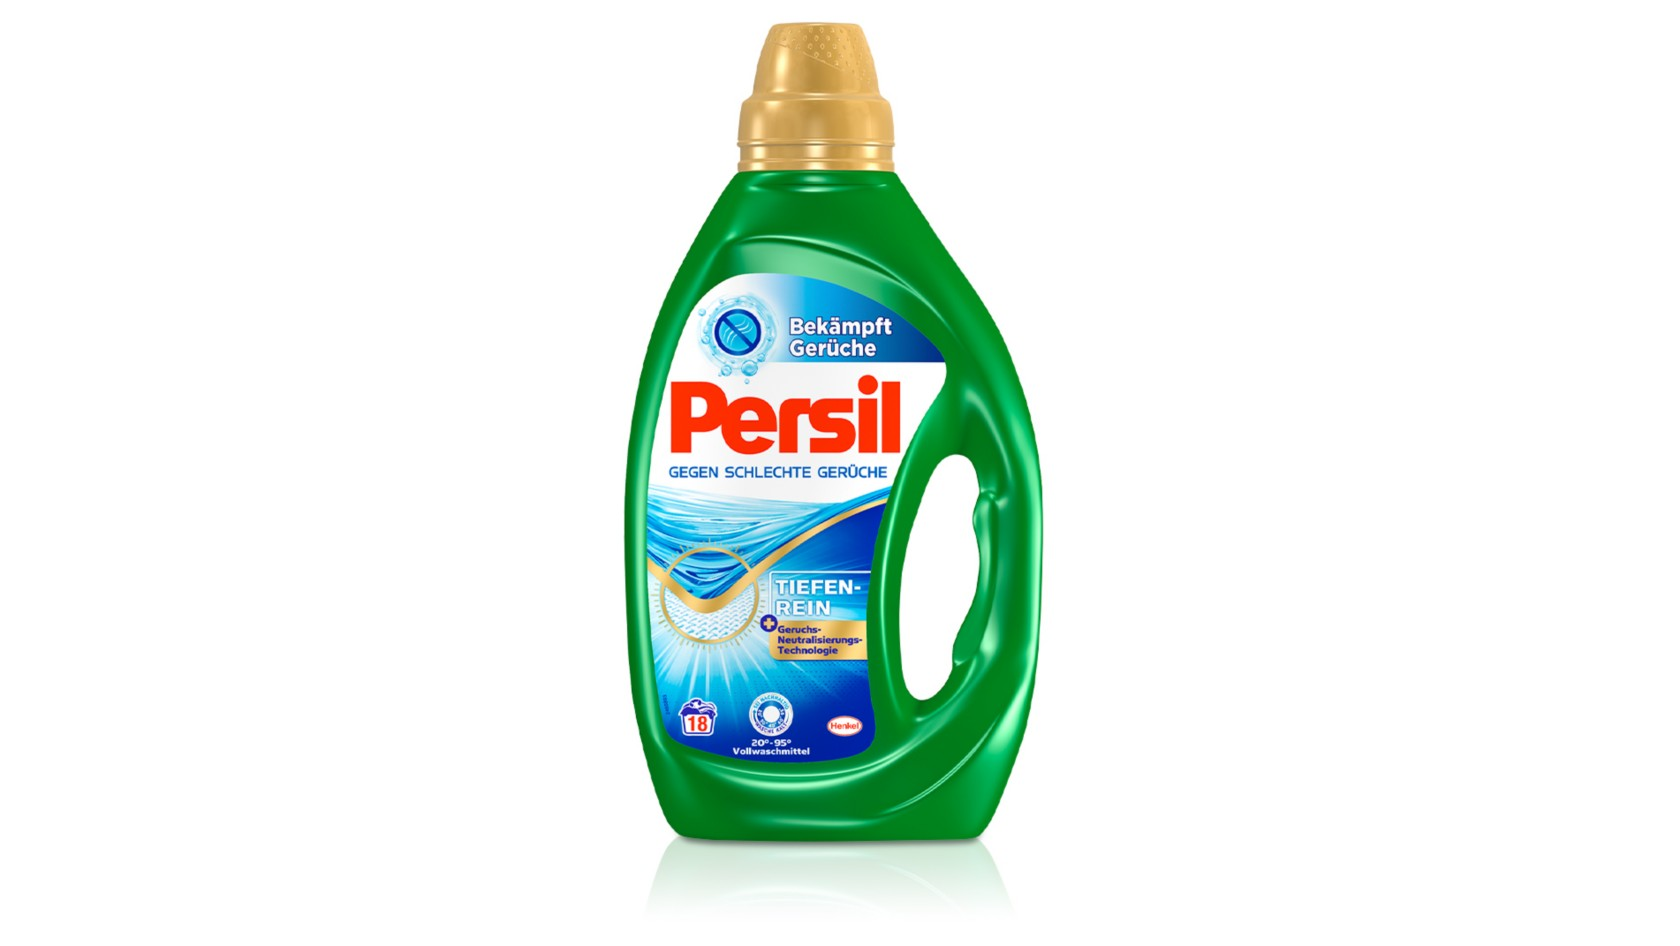 persil-gel-gegen-schlechte-gerüche